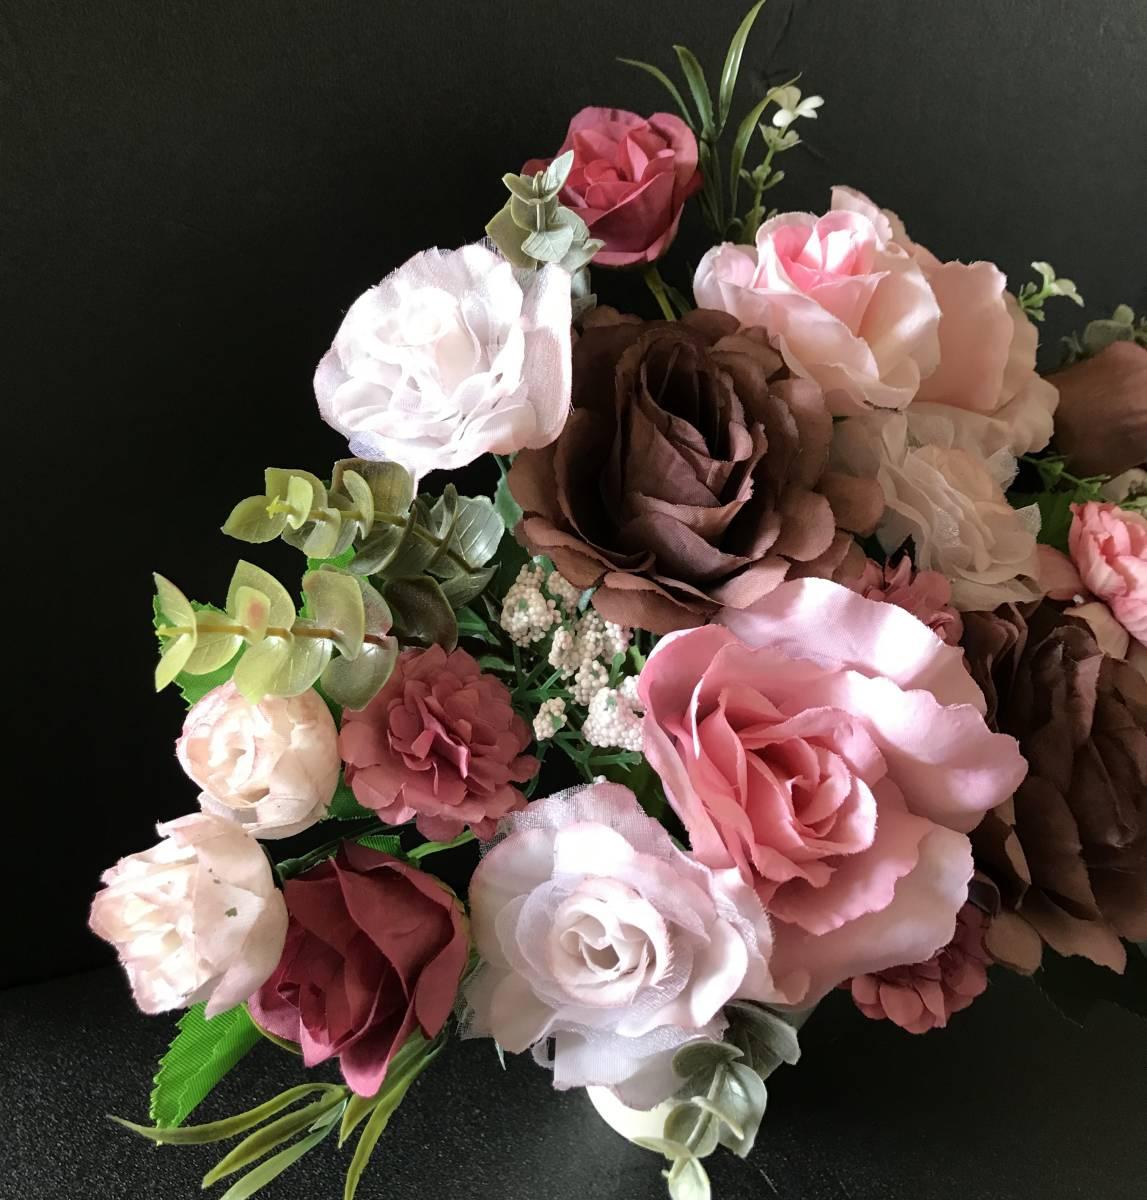 pretty flower����SALE�I�x�[�W���Ԋ�`���R���[�g�u���E���ƃ~���N�e�B�[�s���N���K�N�t�F�~�j���A�����W Image2